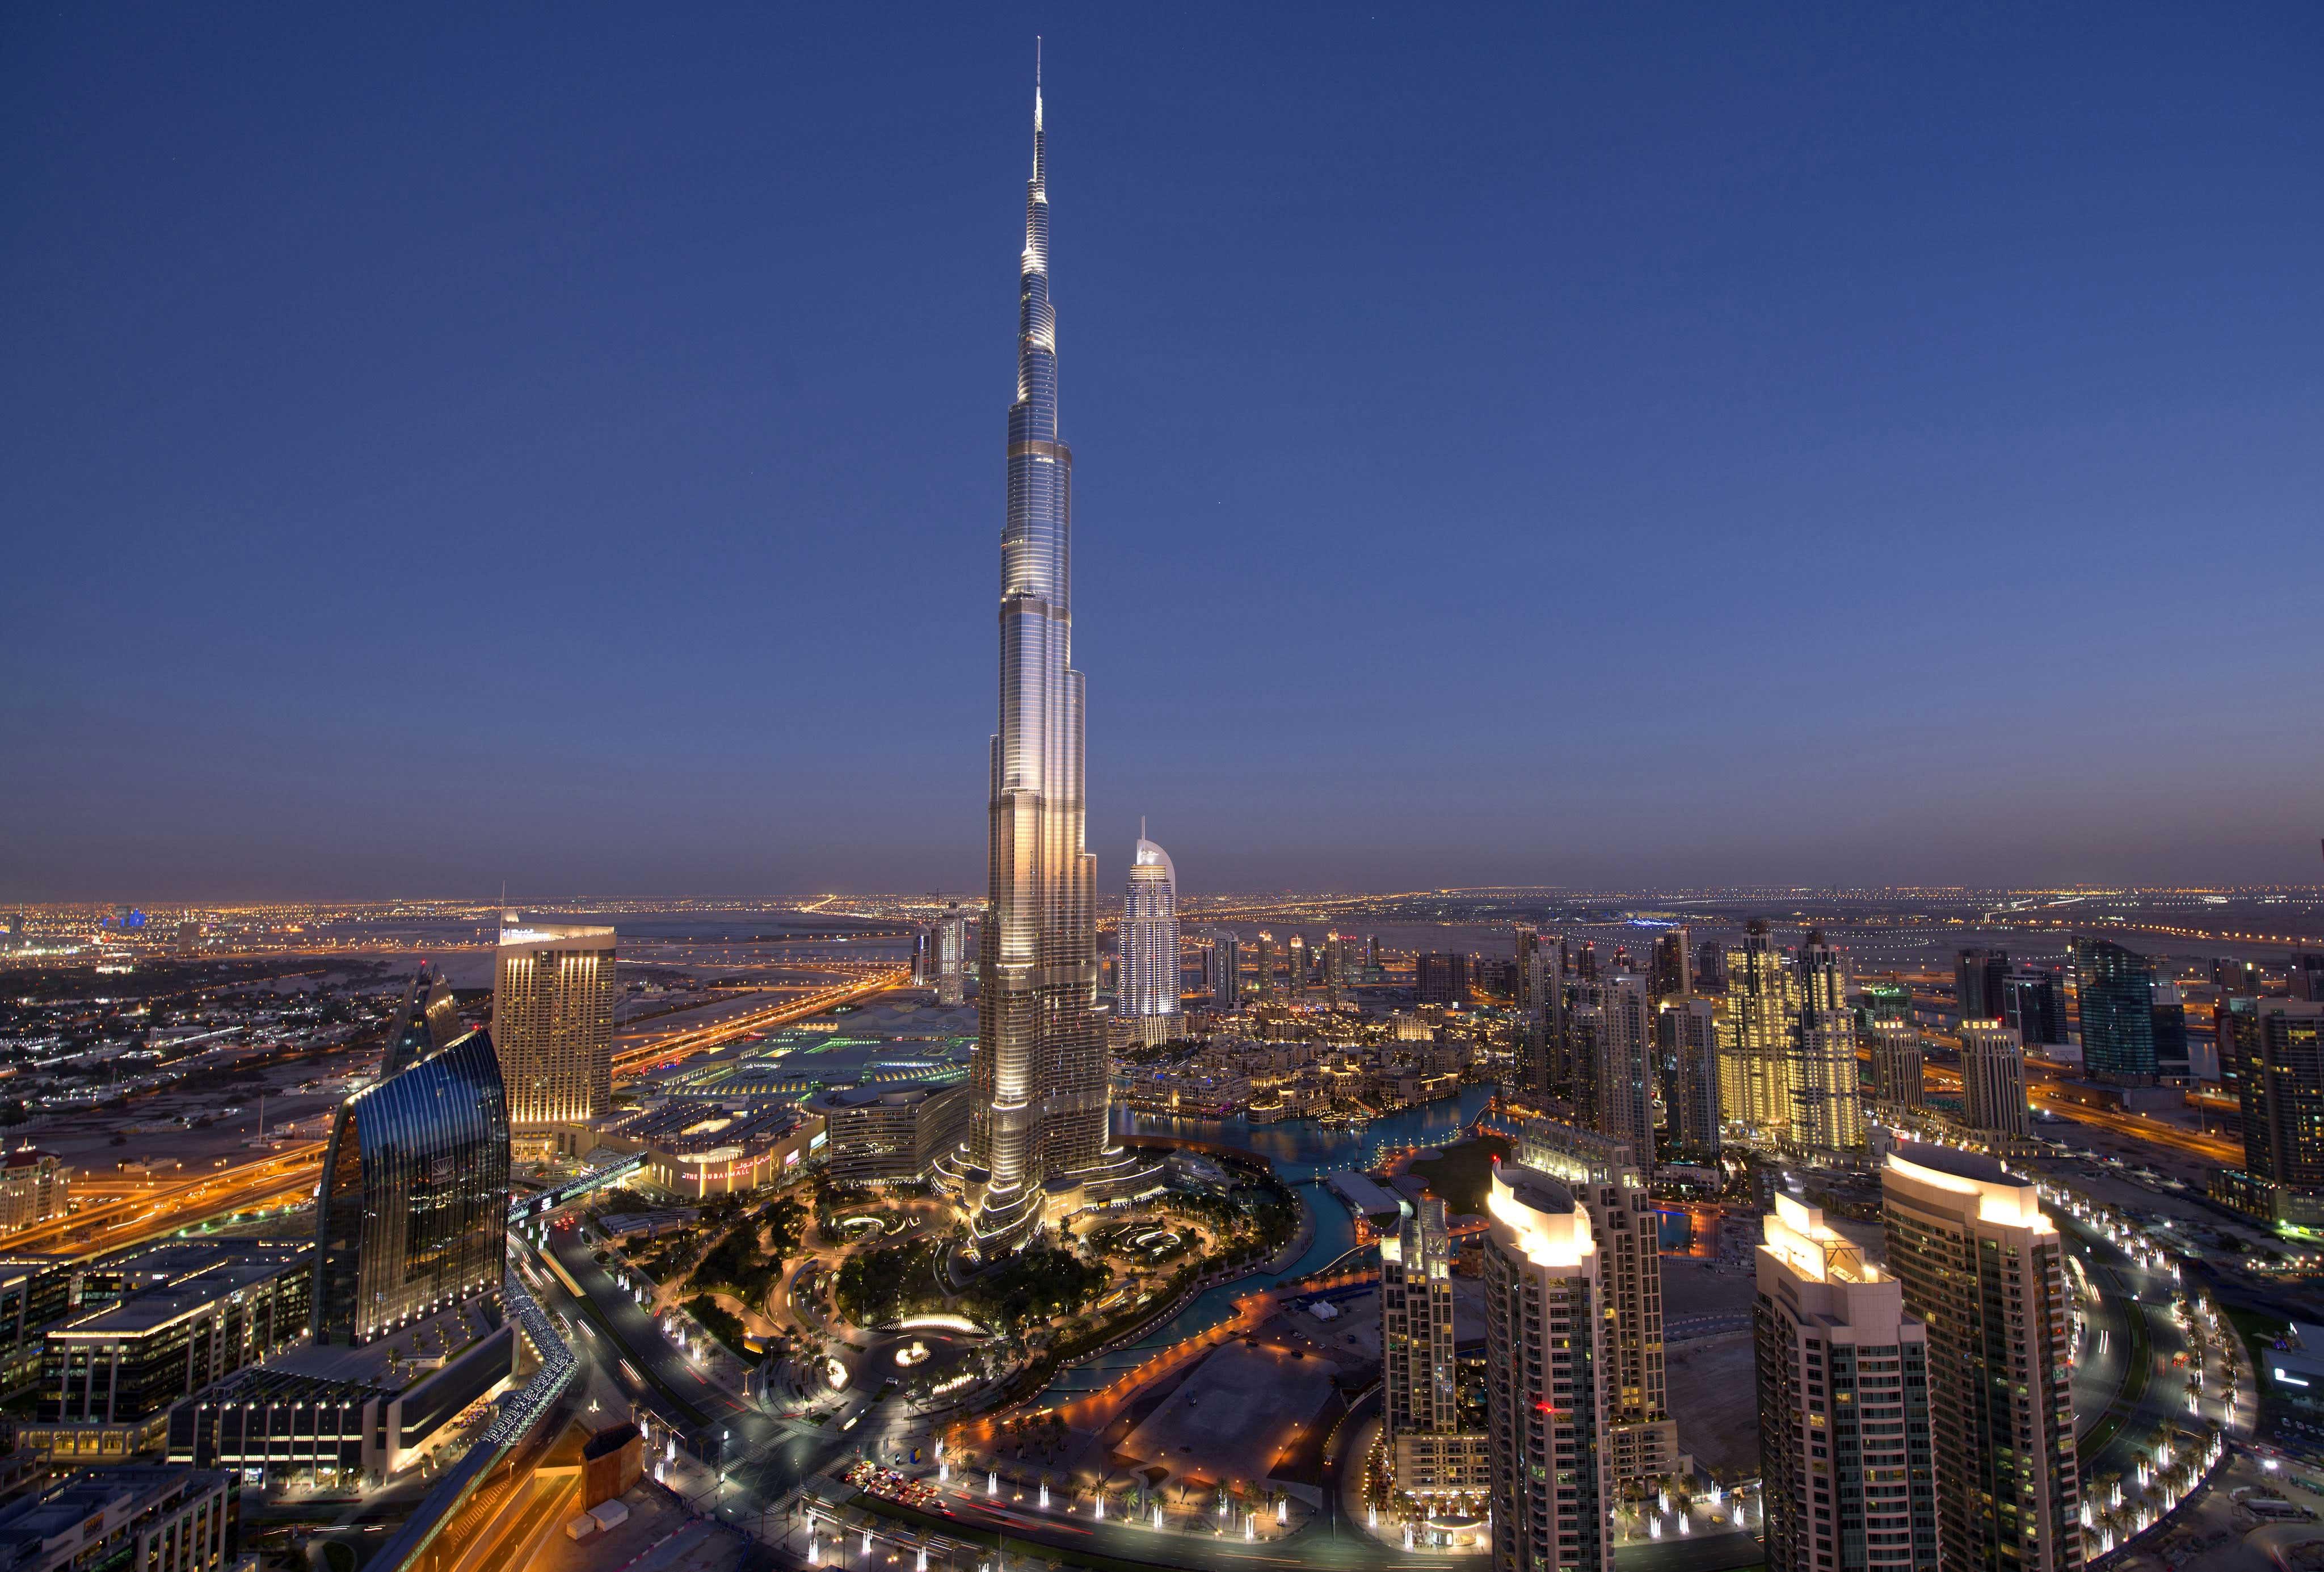 Dubai Shopping Festival - Find your hotel in Dubai with